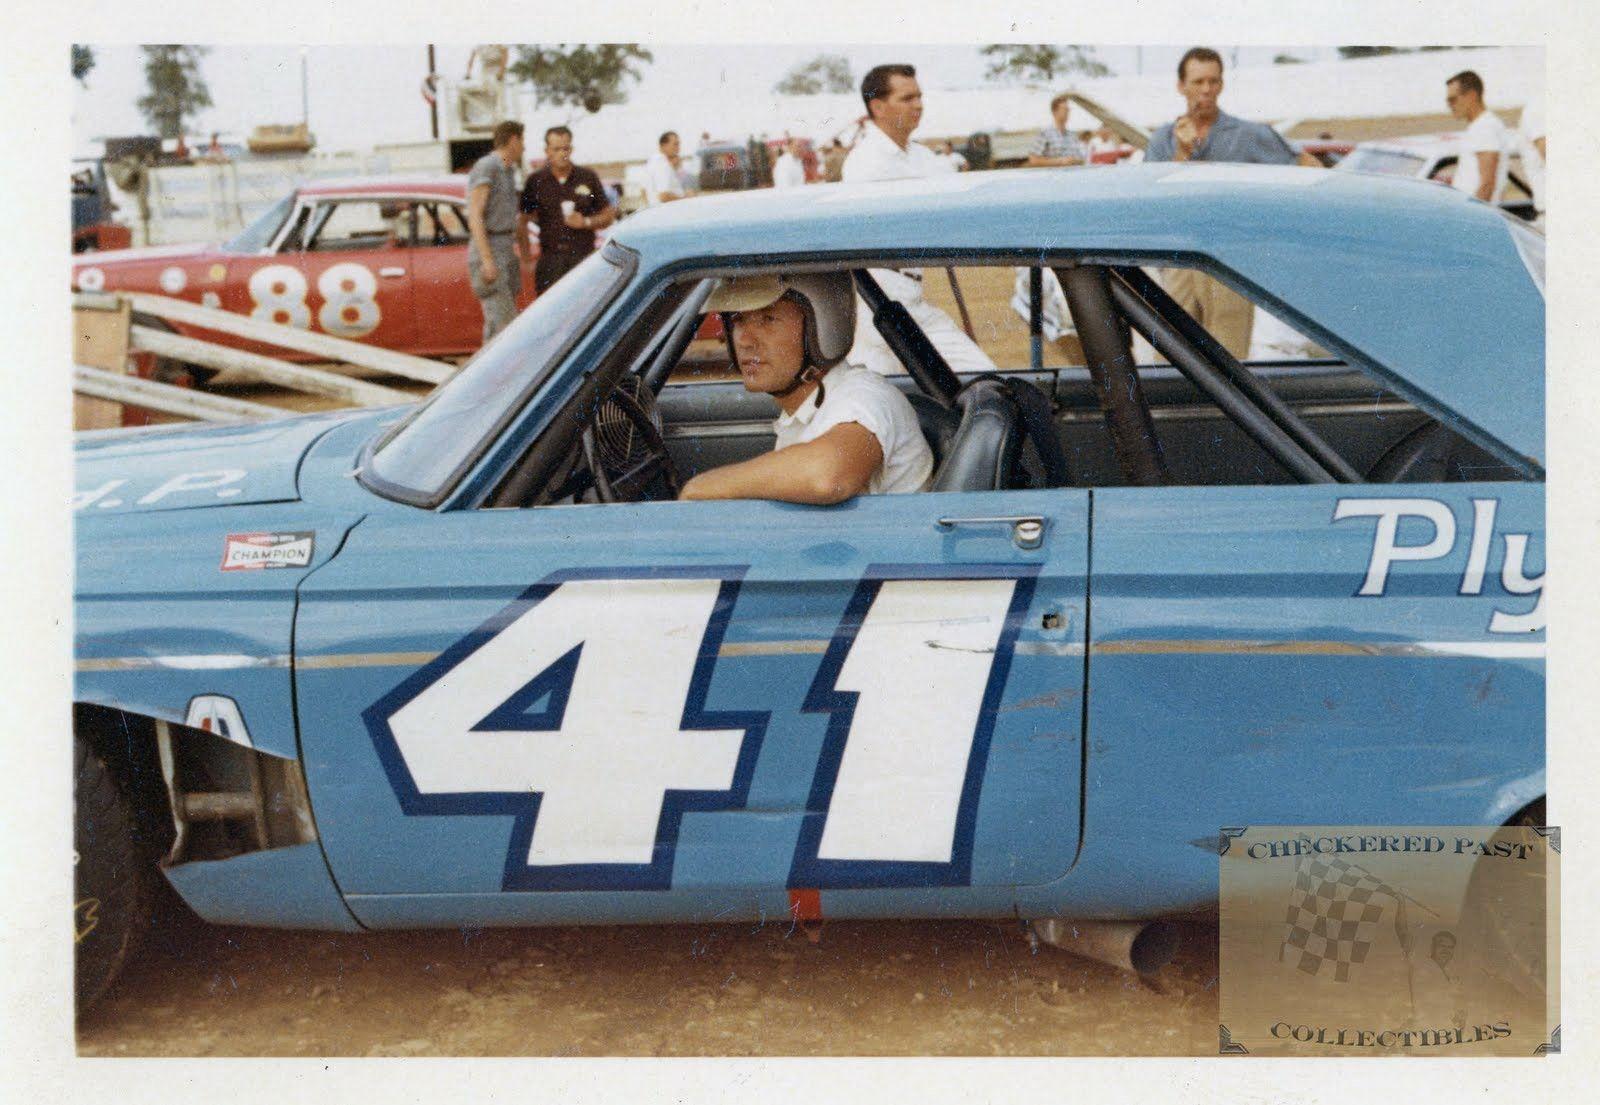 Richard Petty 41 Drag Racing Cars Classic Racing Richard Petty